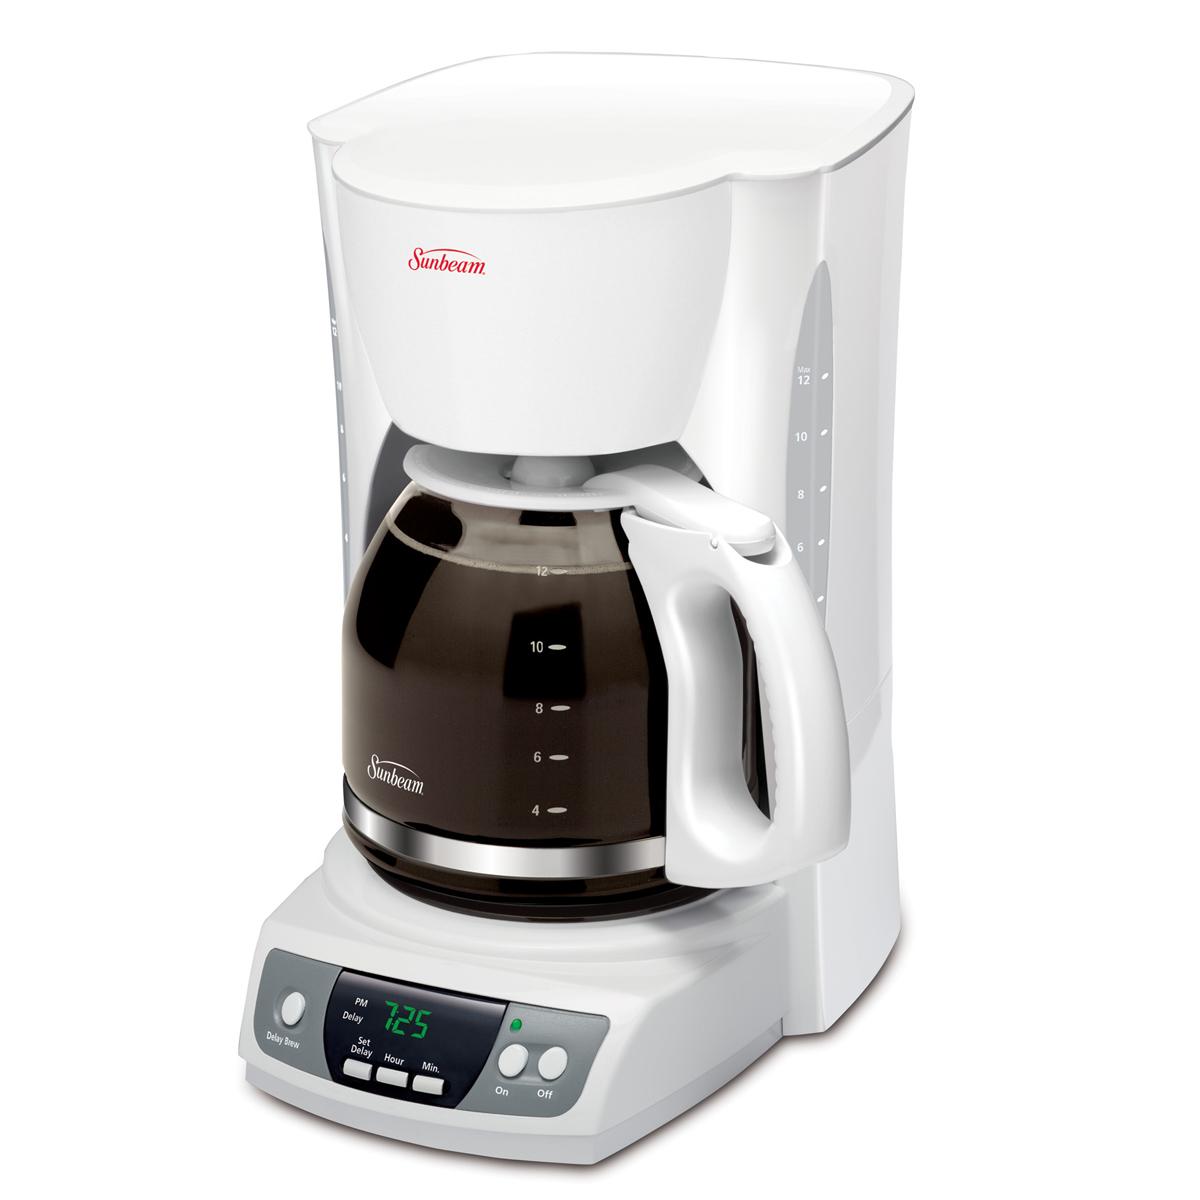 Sunbeam 12-Cup Programmable Coffeemaker, White 6964-33 Sunbeam Canada